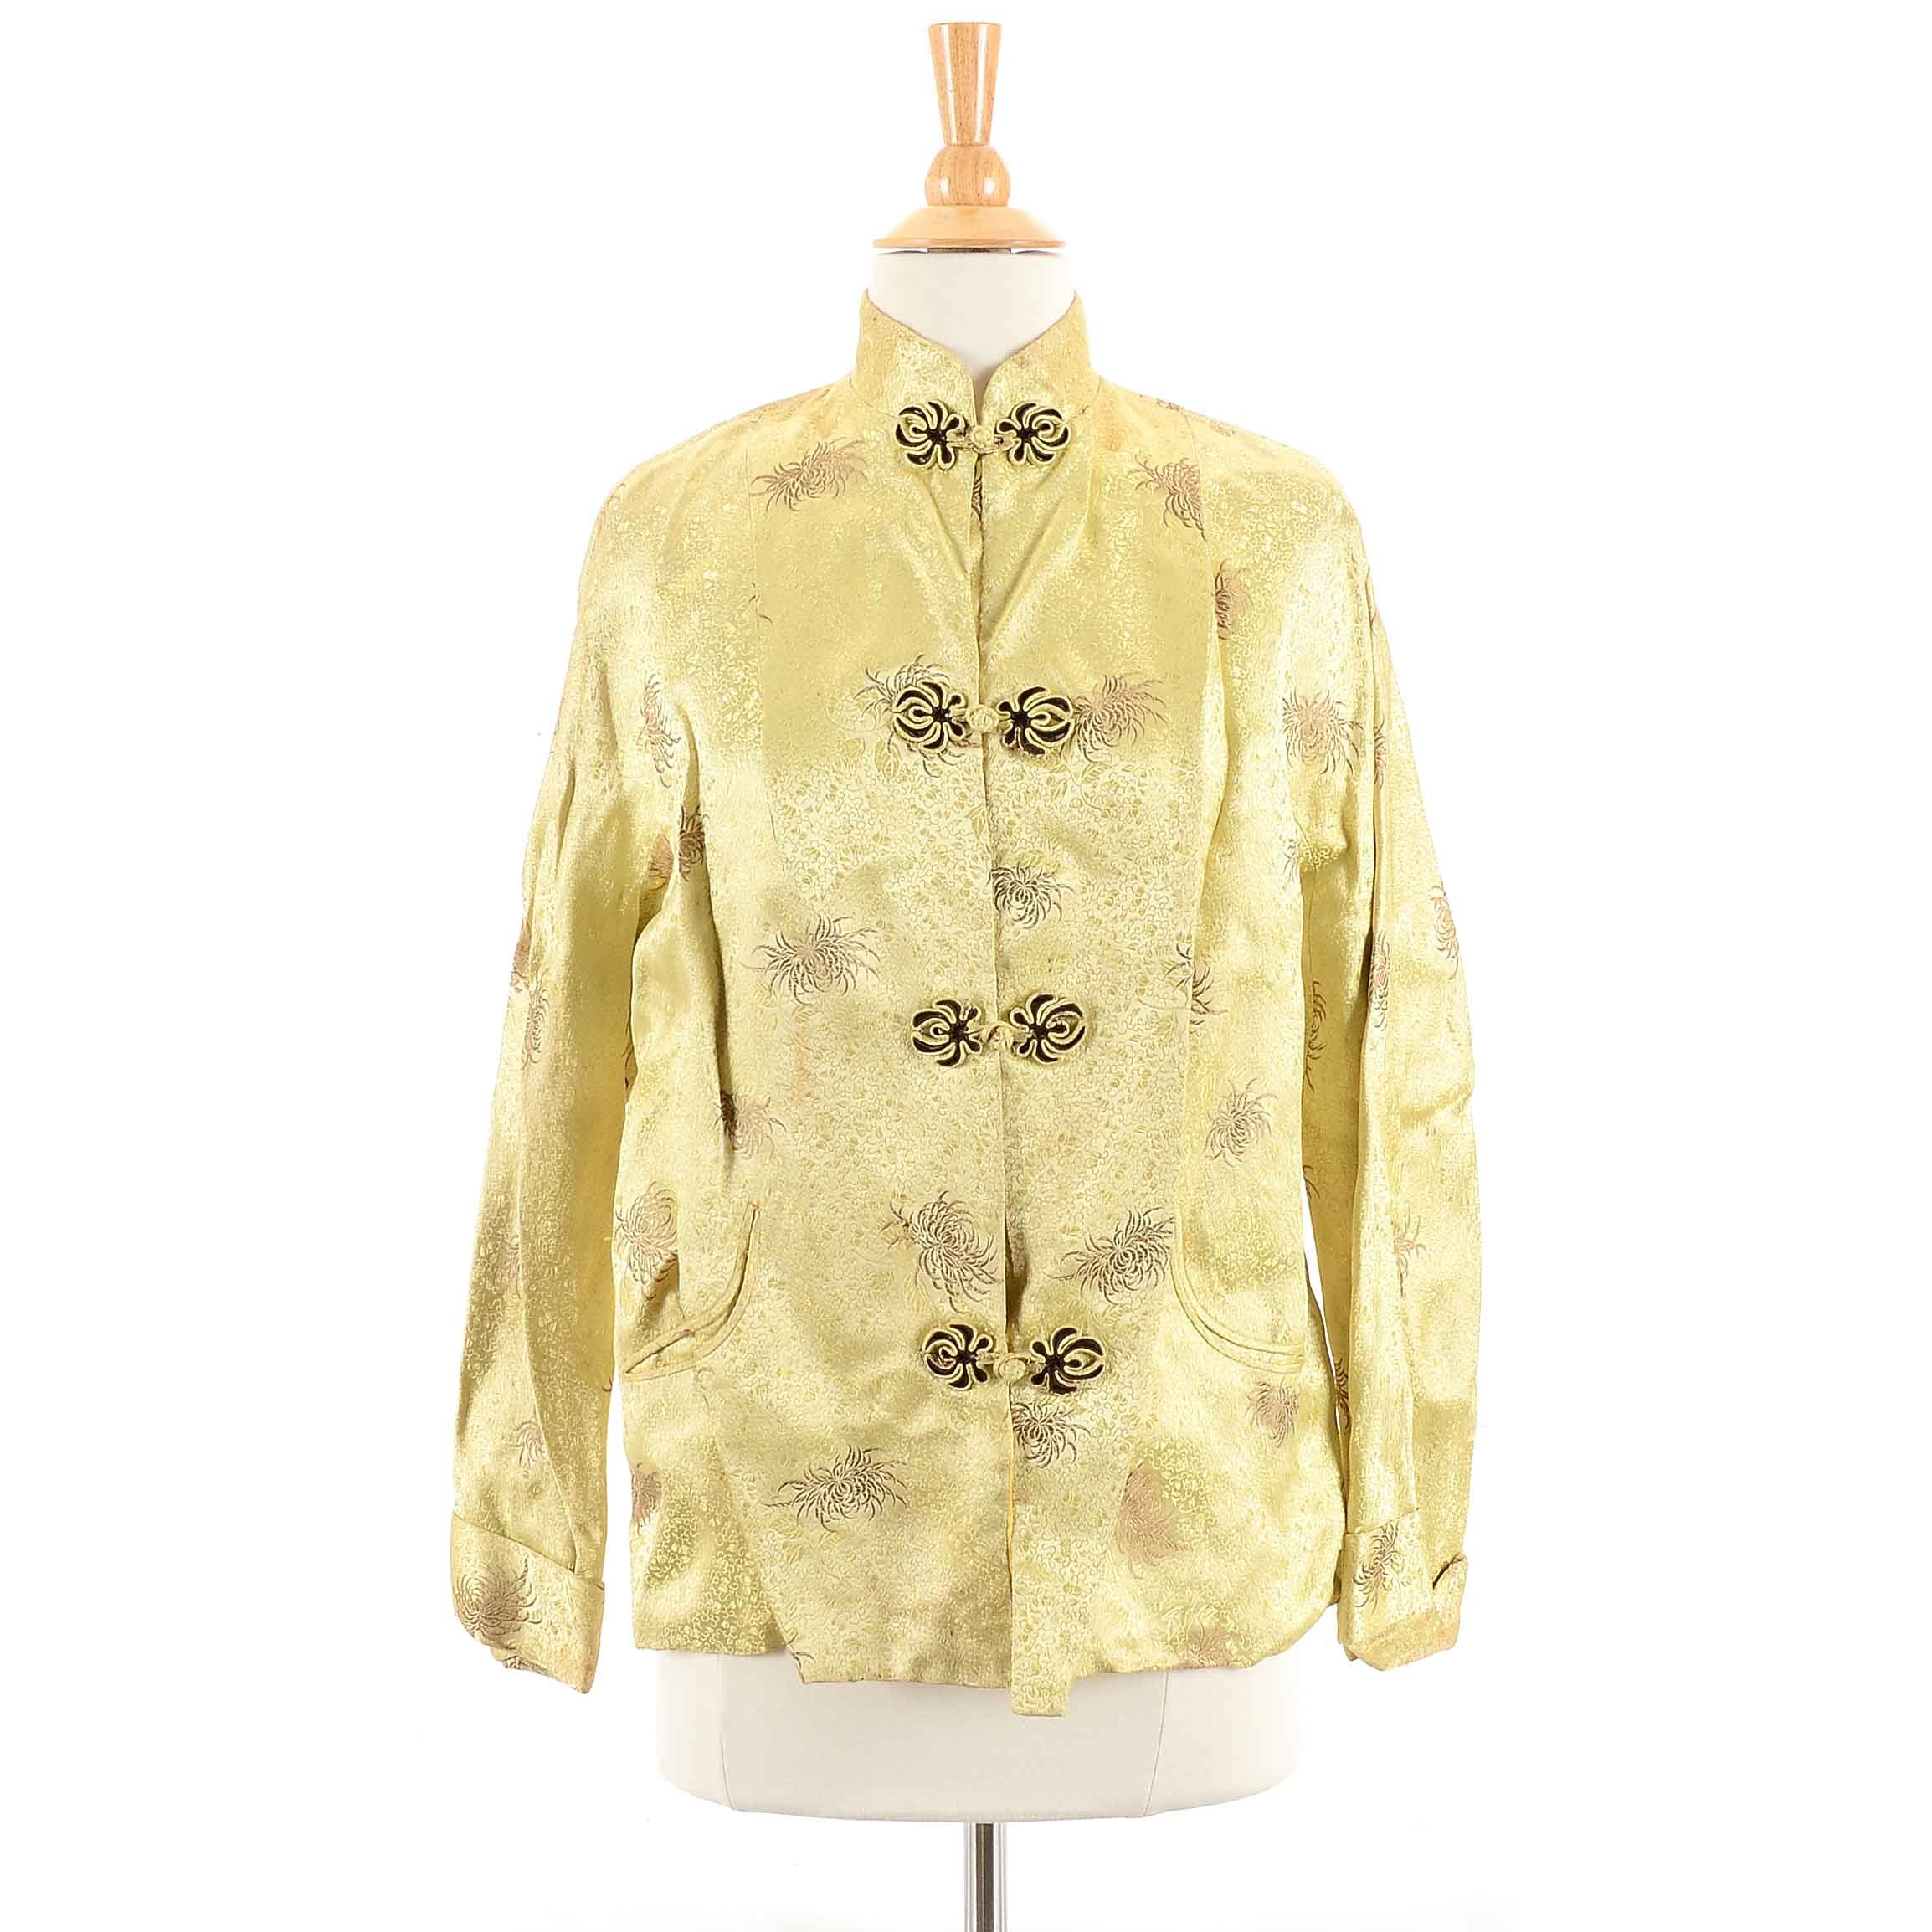 Vintage Chinese Yellow Silk Brocade Jacket with Spider Mum Motif